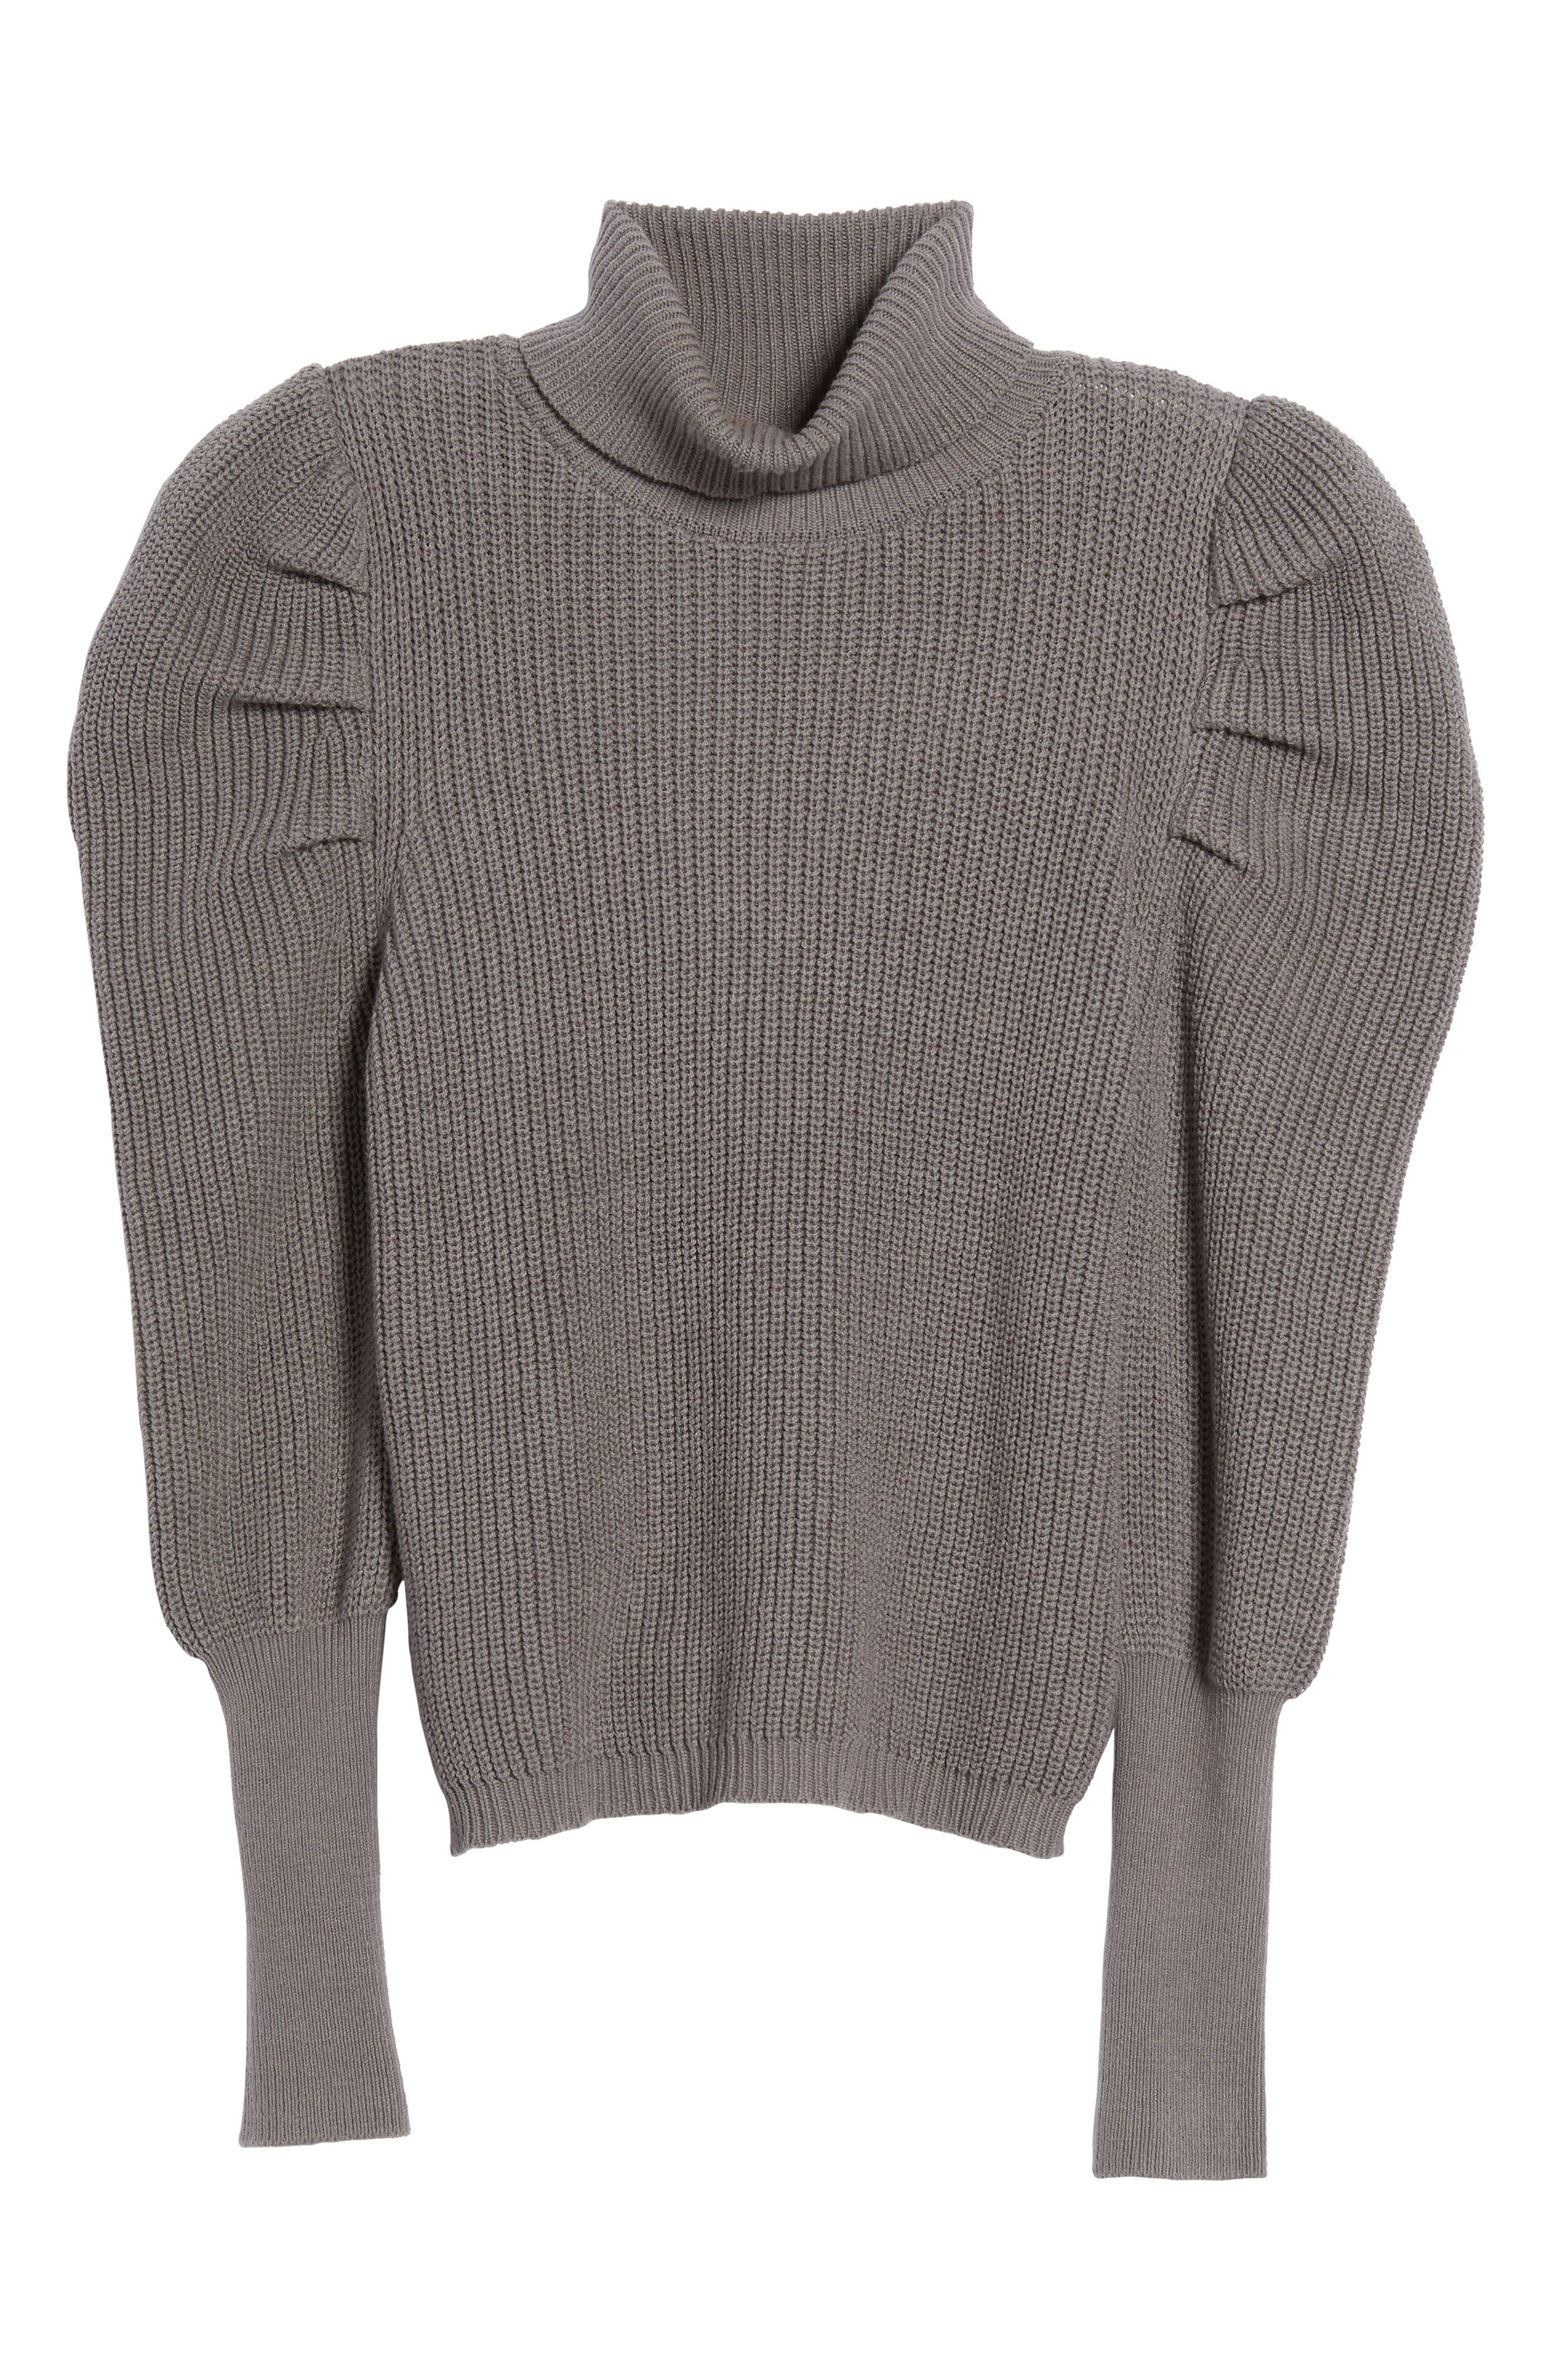 Puff Sleeve Turtleneck Sweater,                             Alternate thumbnail 6, color,                             030